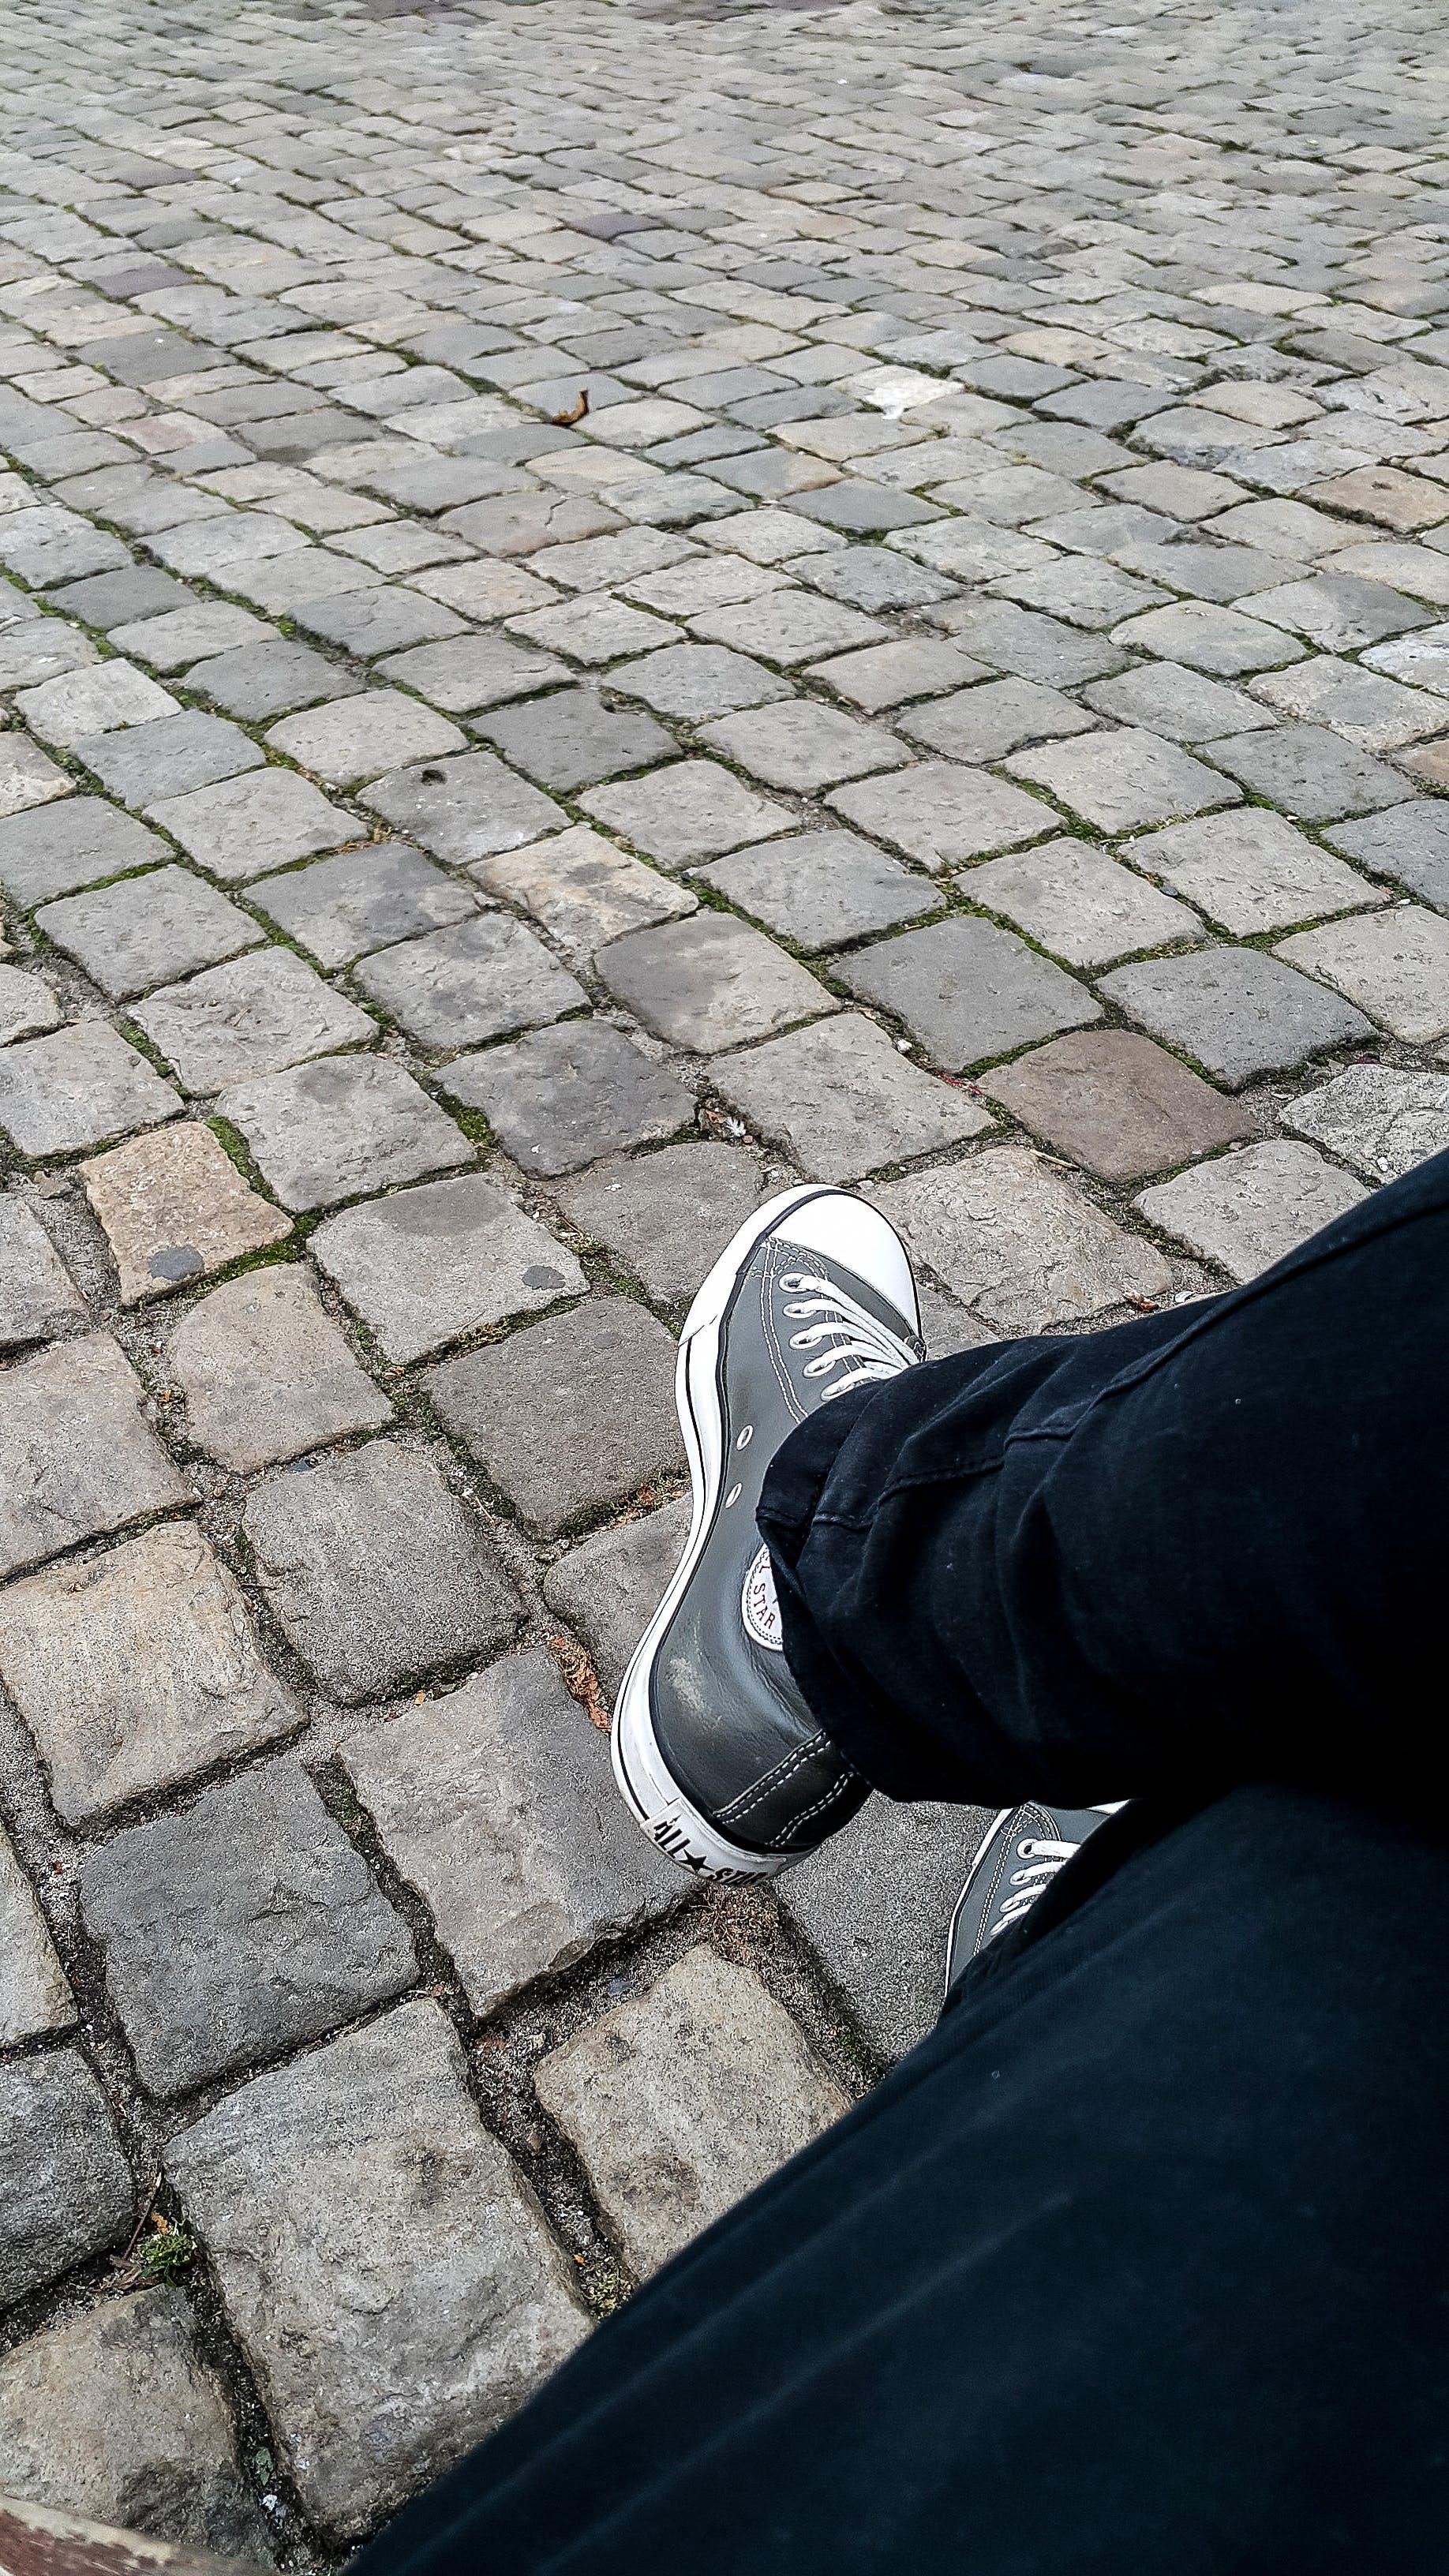 Free stock photo of block stone, keds, legs, stone-block pavement